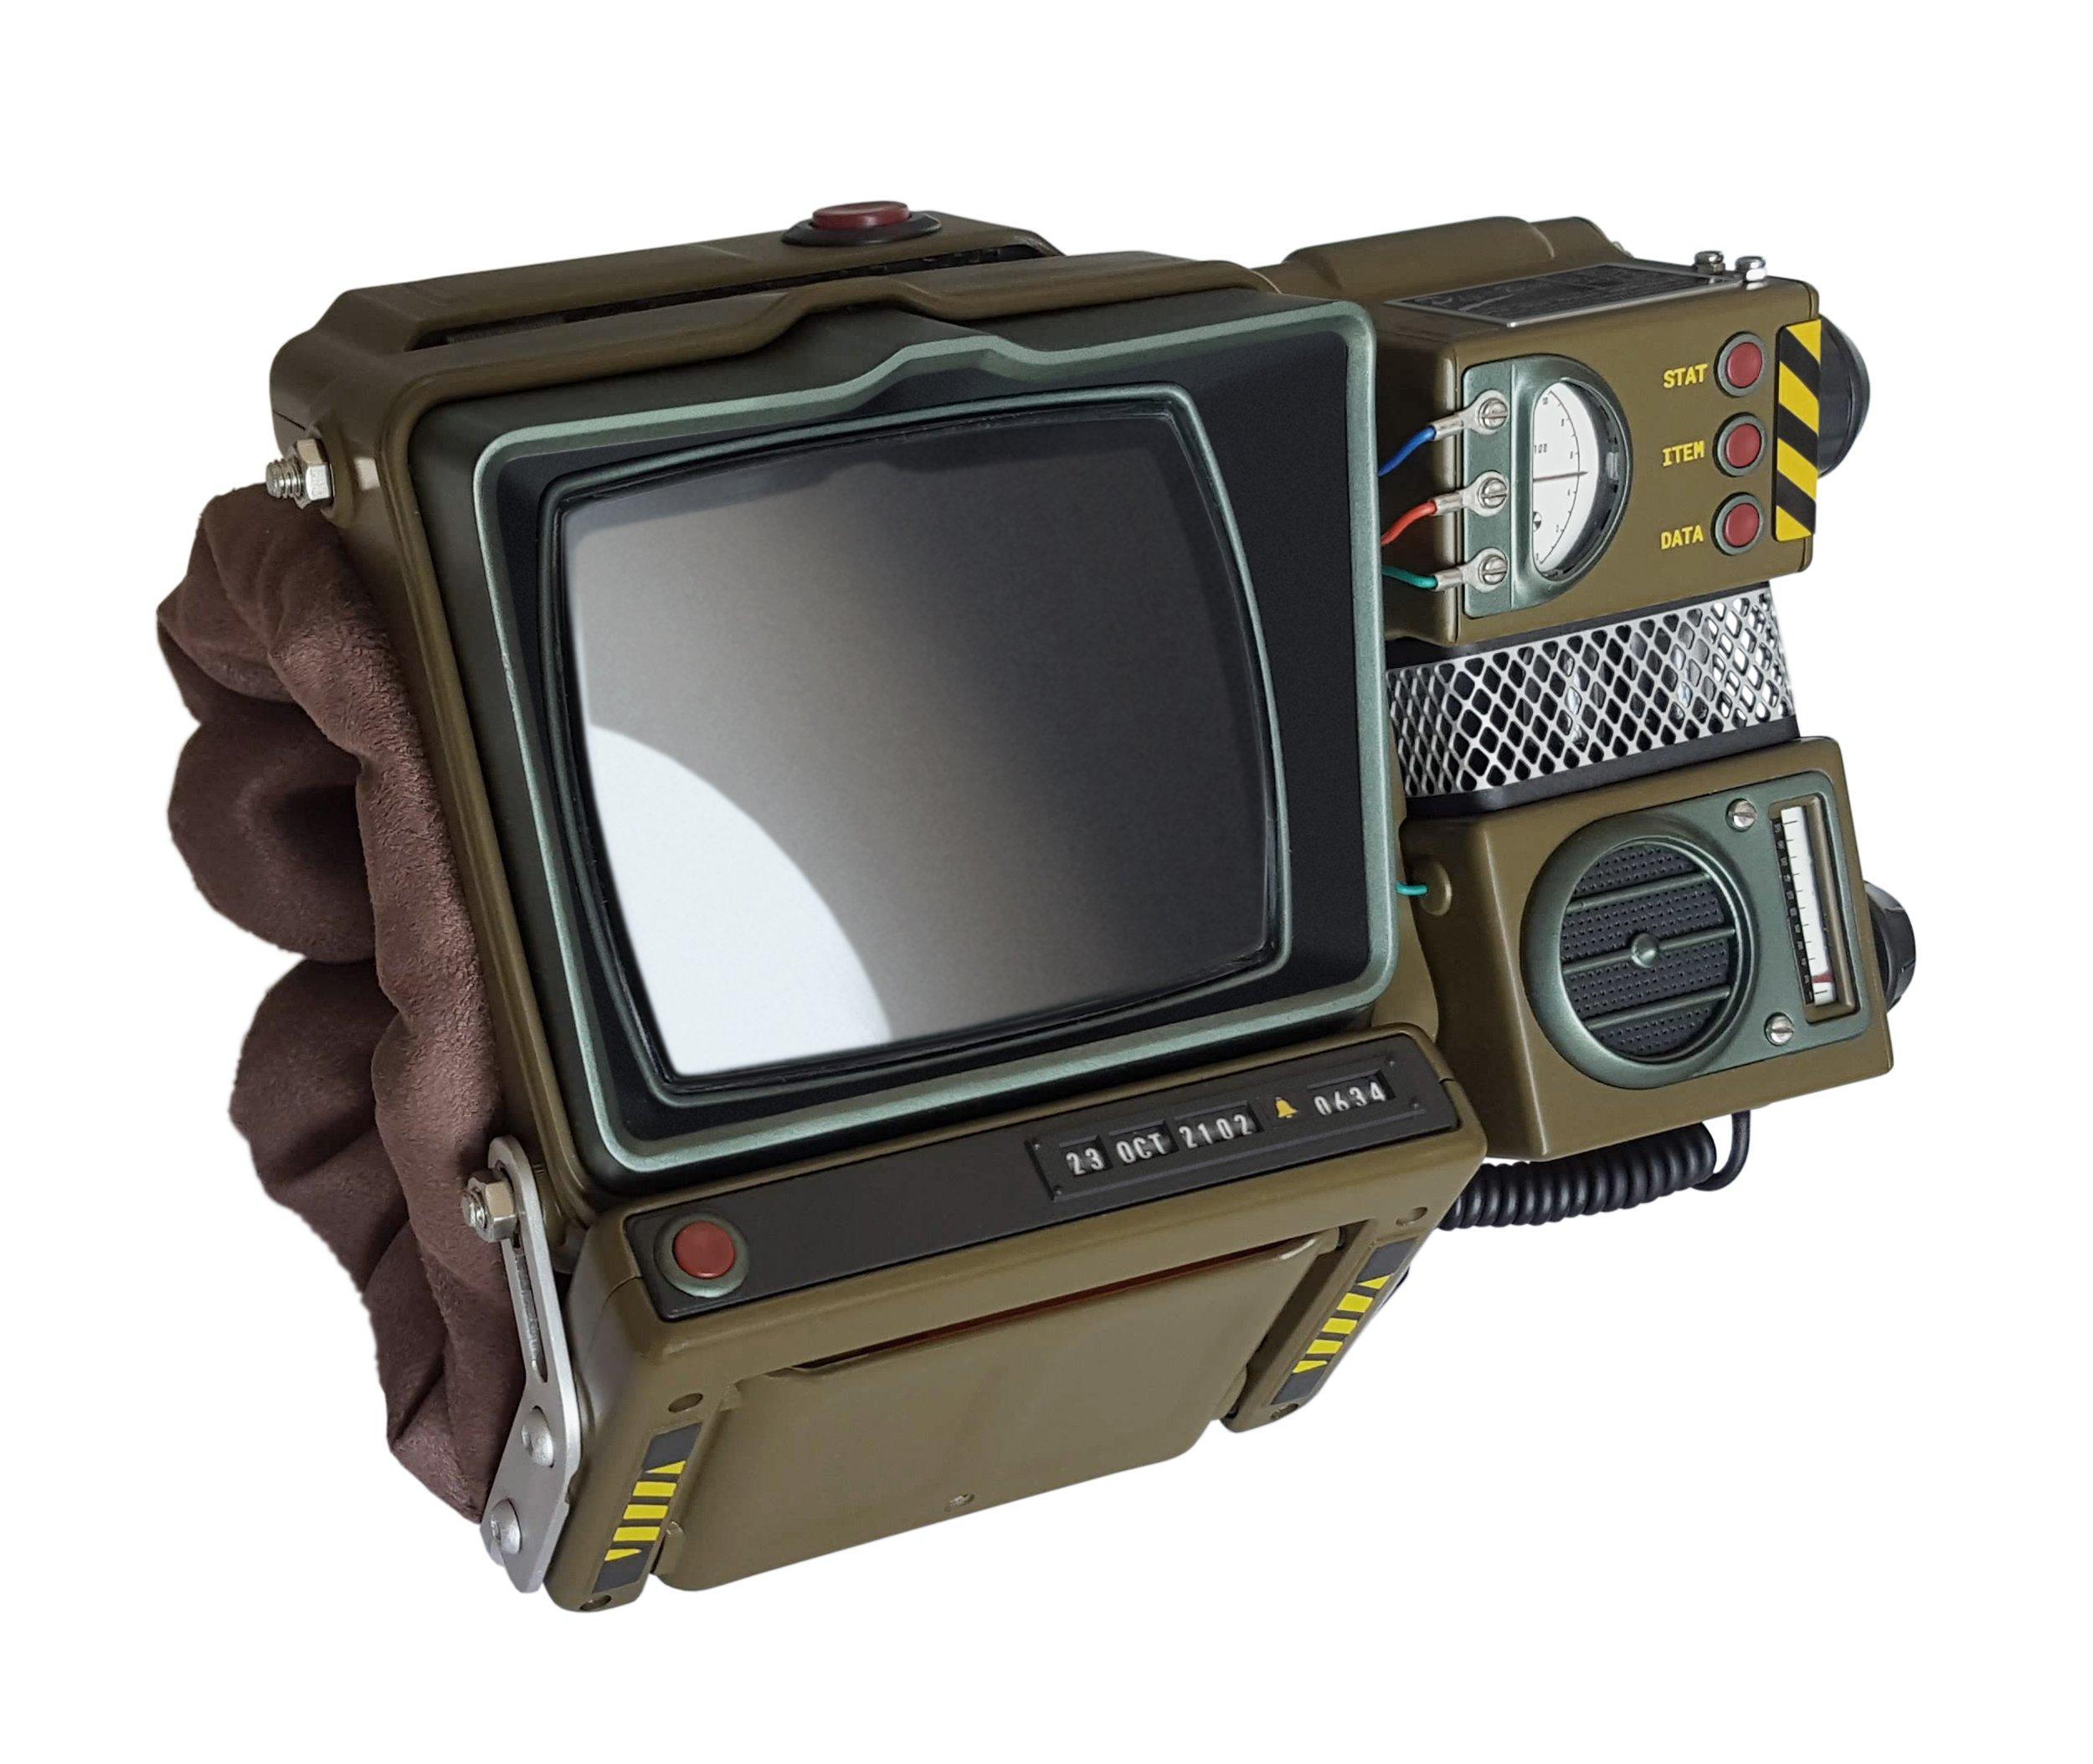 Fallout 76 Pip-Boy 2000 Mk VI Self-Assembly Construction Kit - Only at  GameStop | GameStop